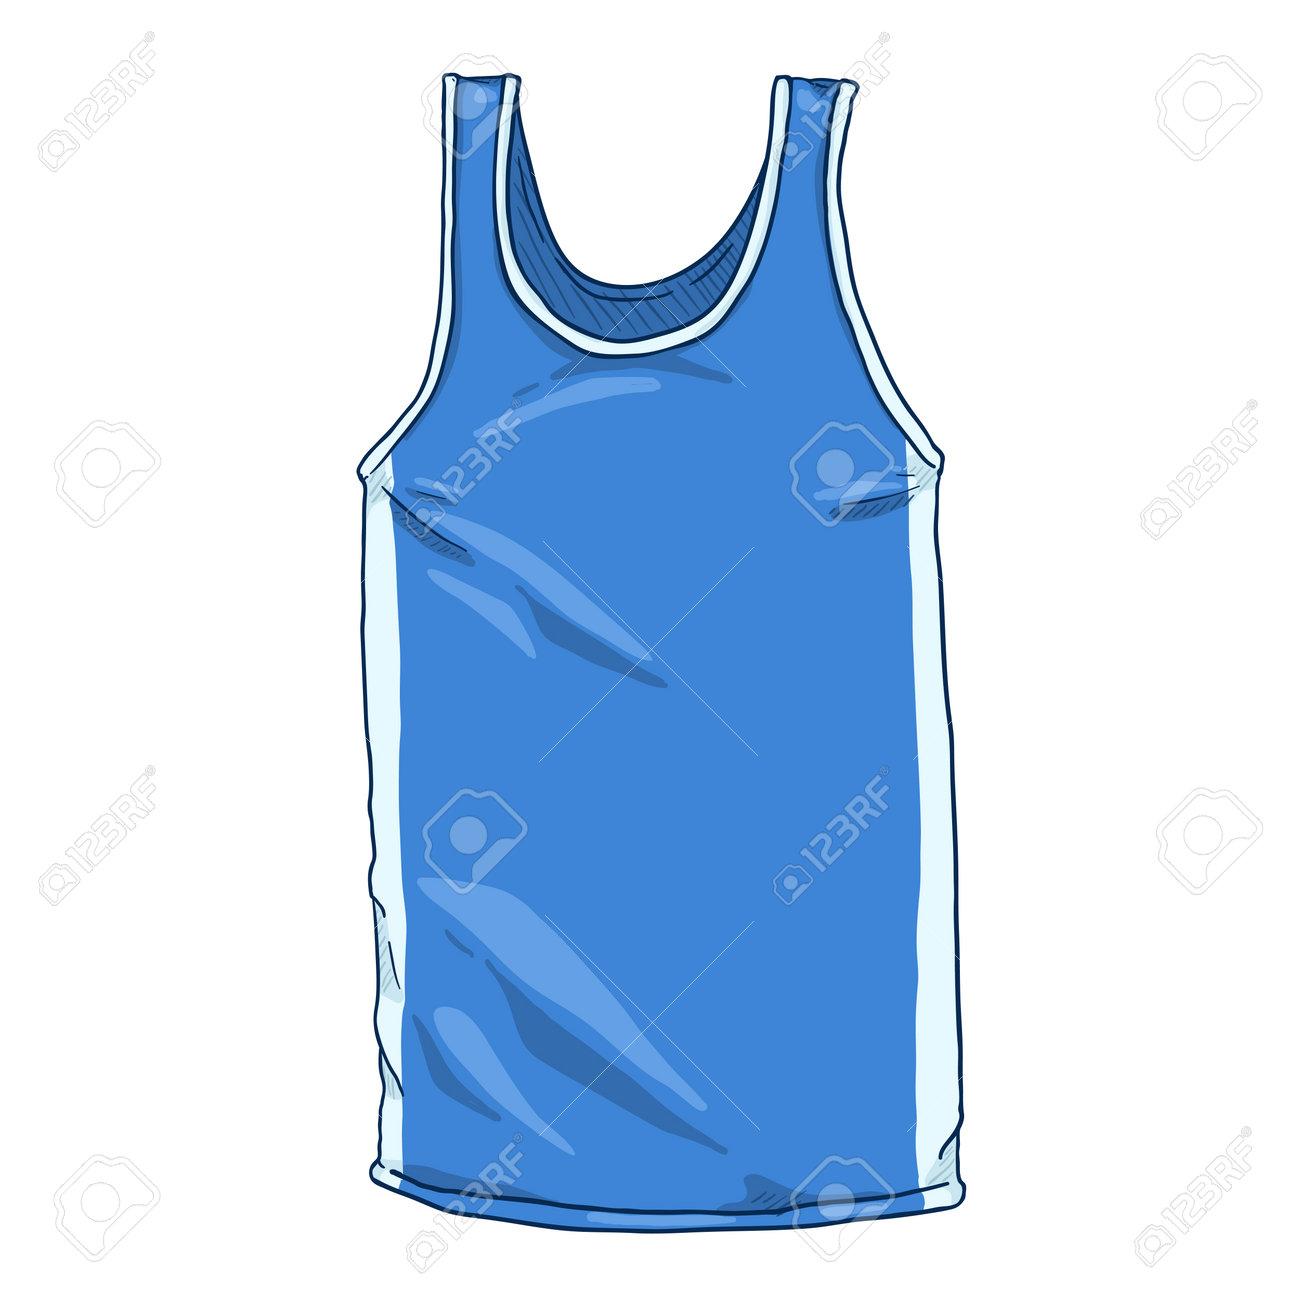 Vector Cartoon Blue Boxing Tank Shirt - 168798659